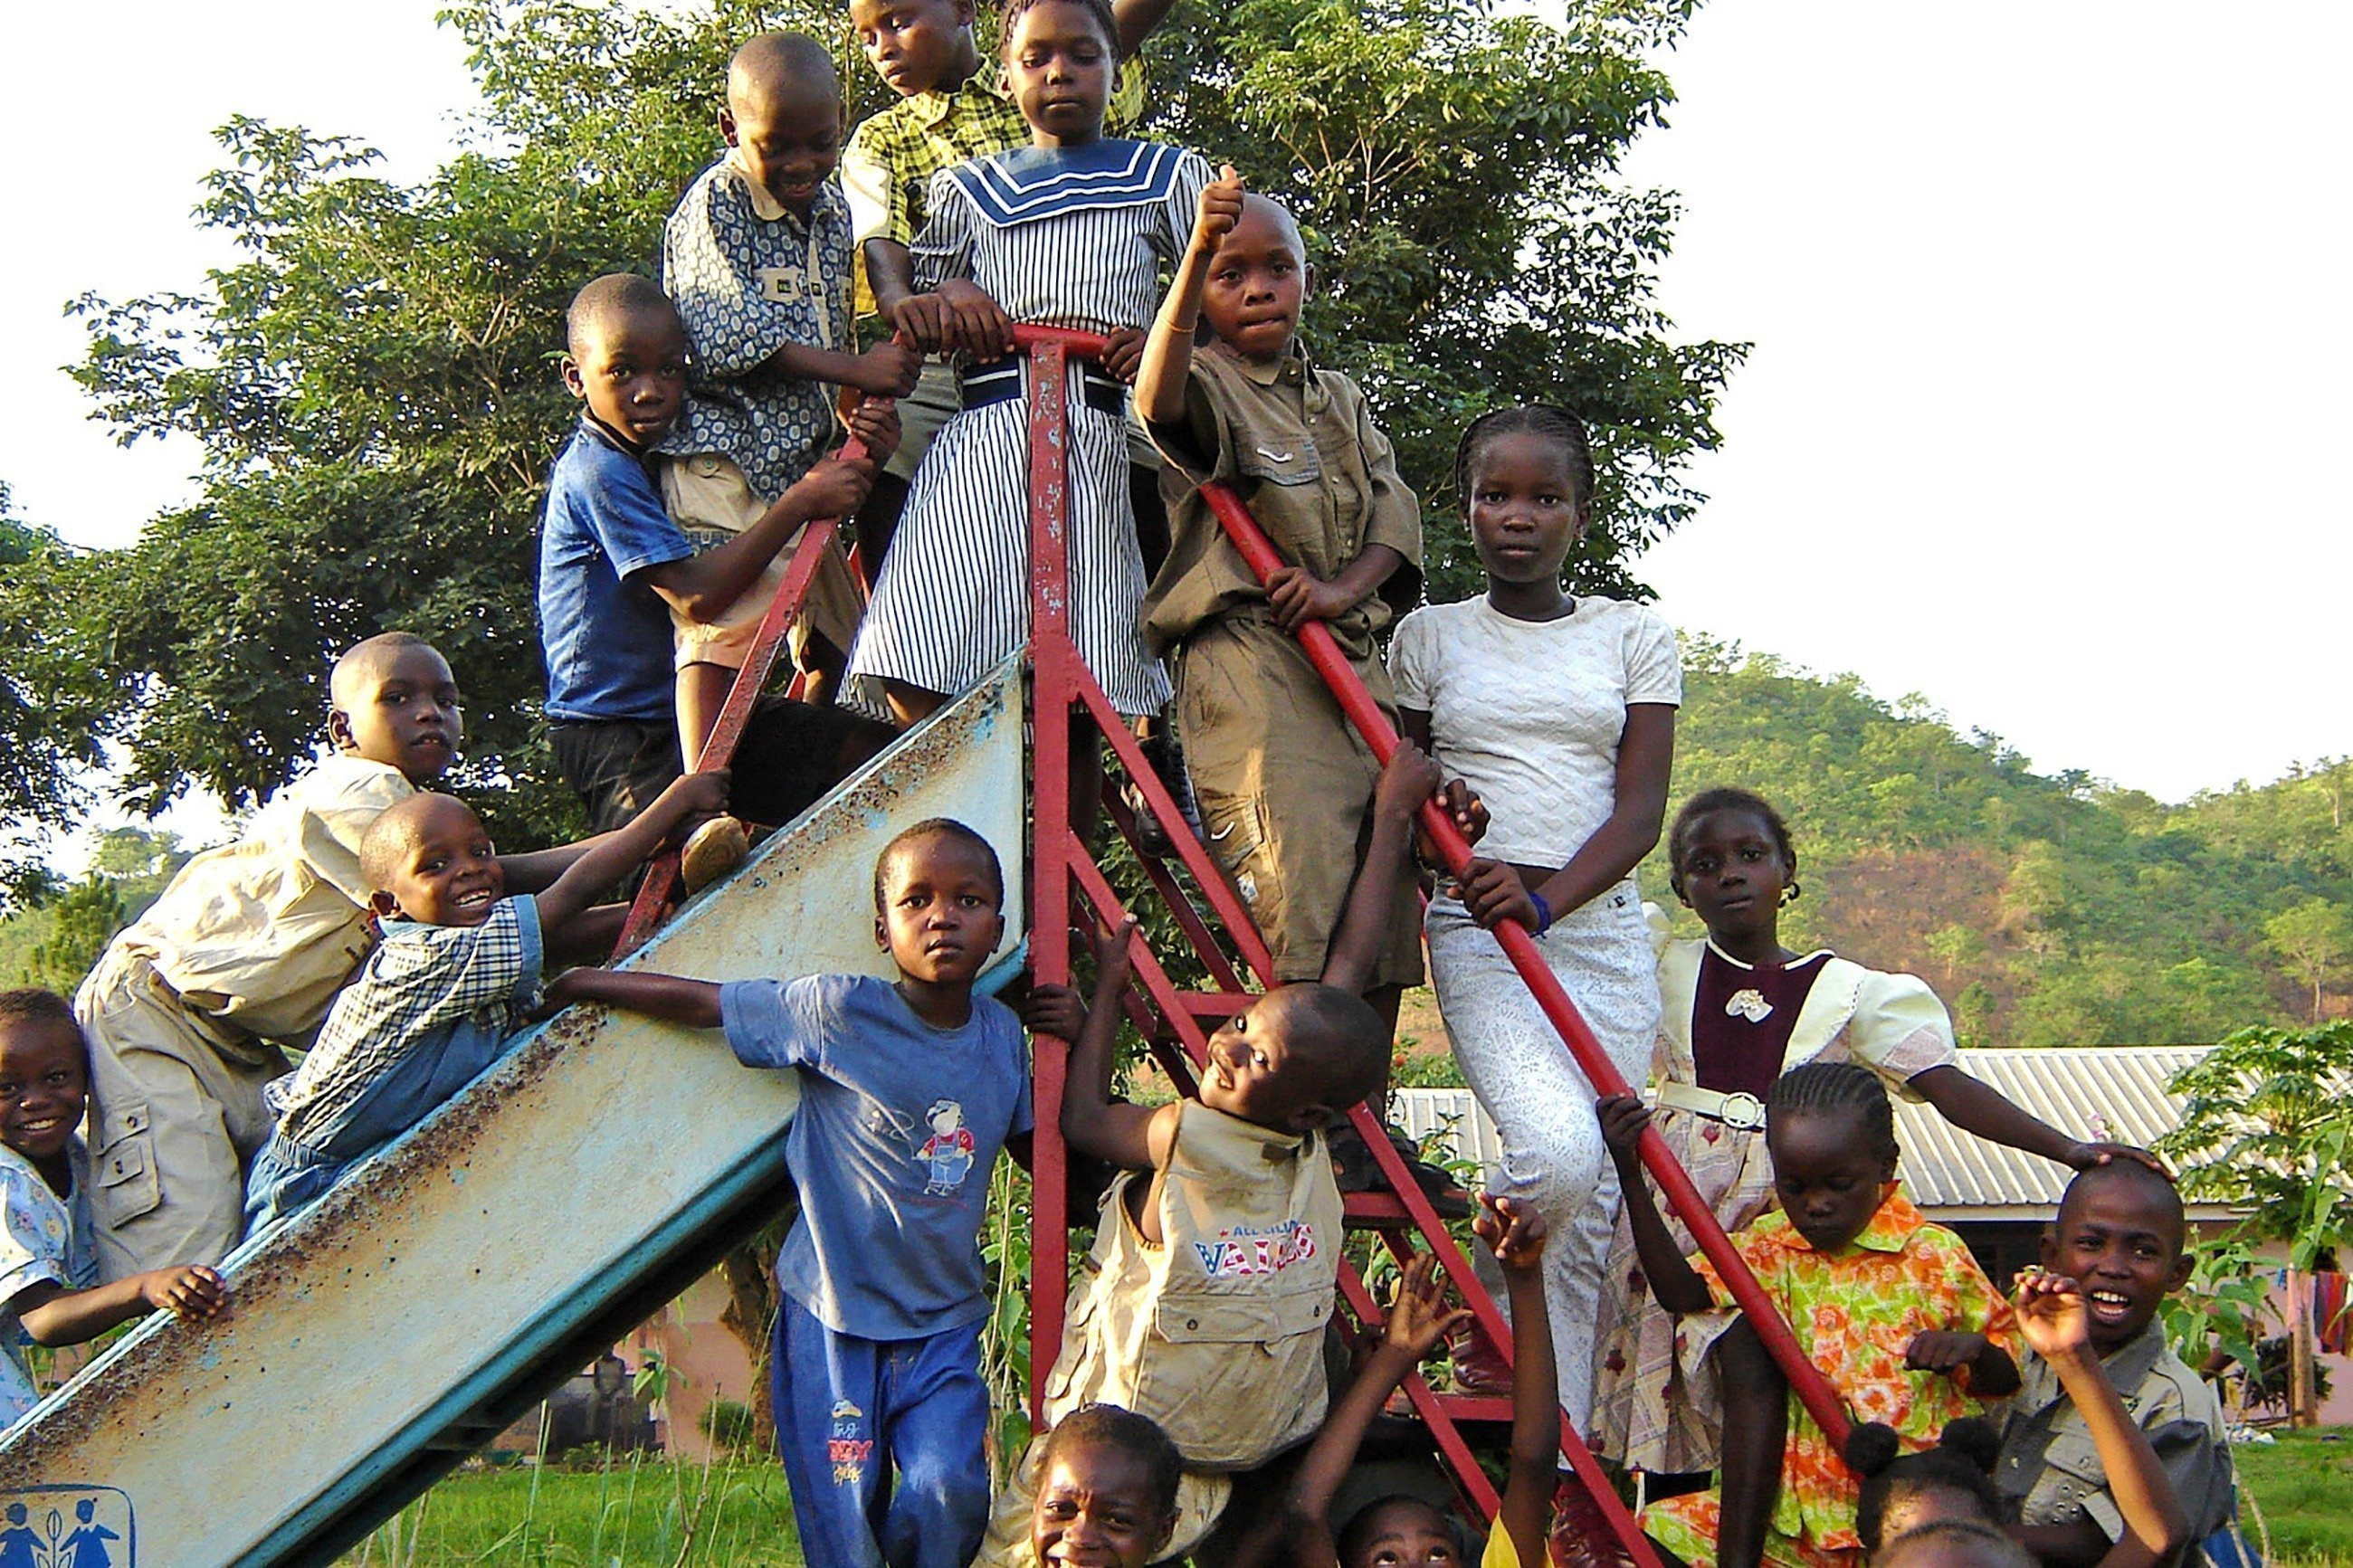 Des enfants devant un toboggan.